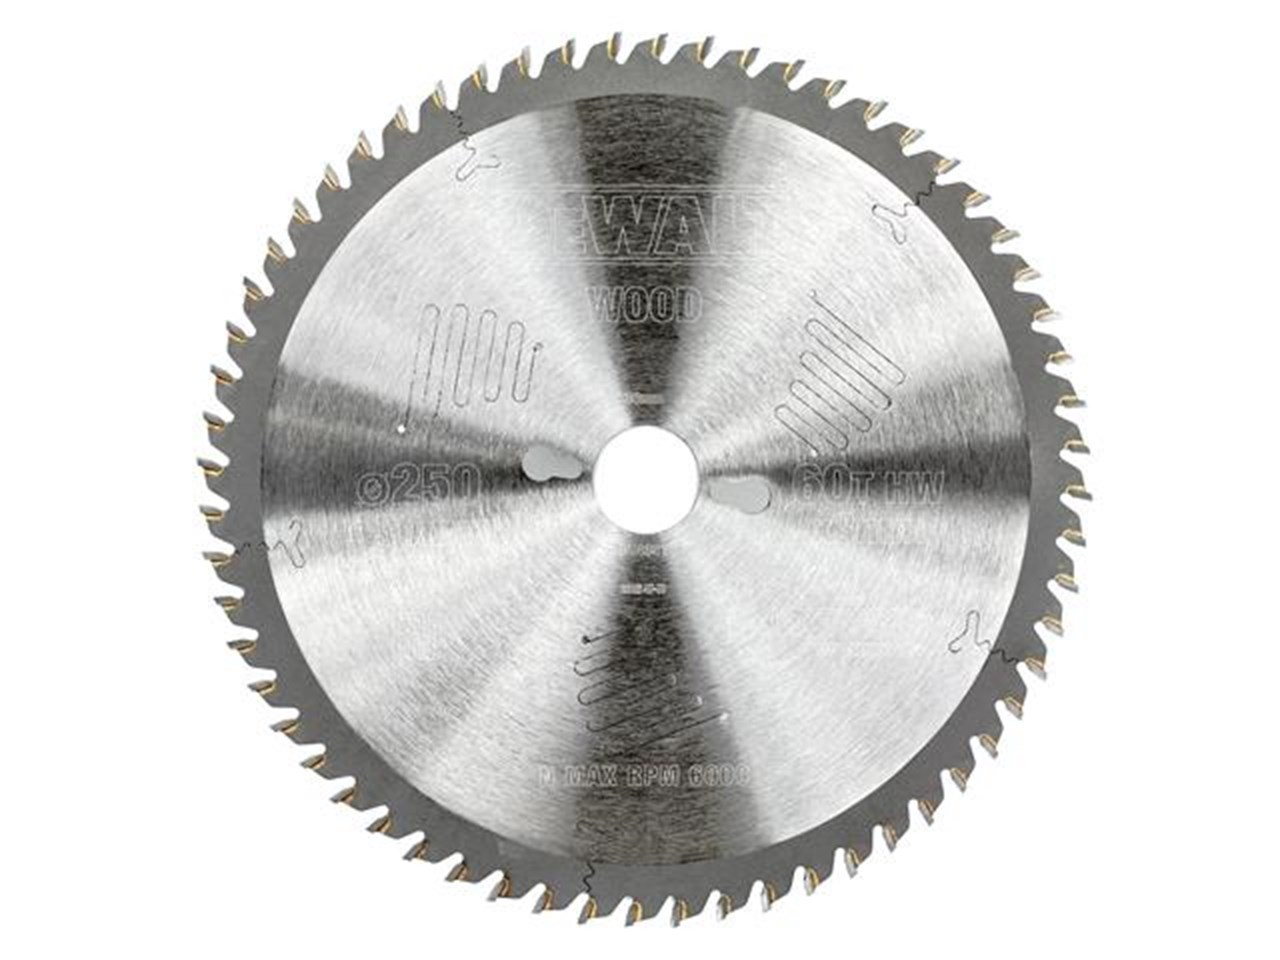 Dewalt dt4351qz extreme circular saw blade 250 x 30 x 60t greentooth Image collections